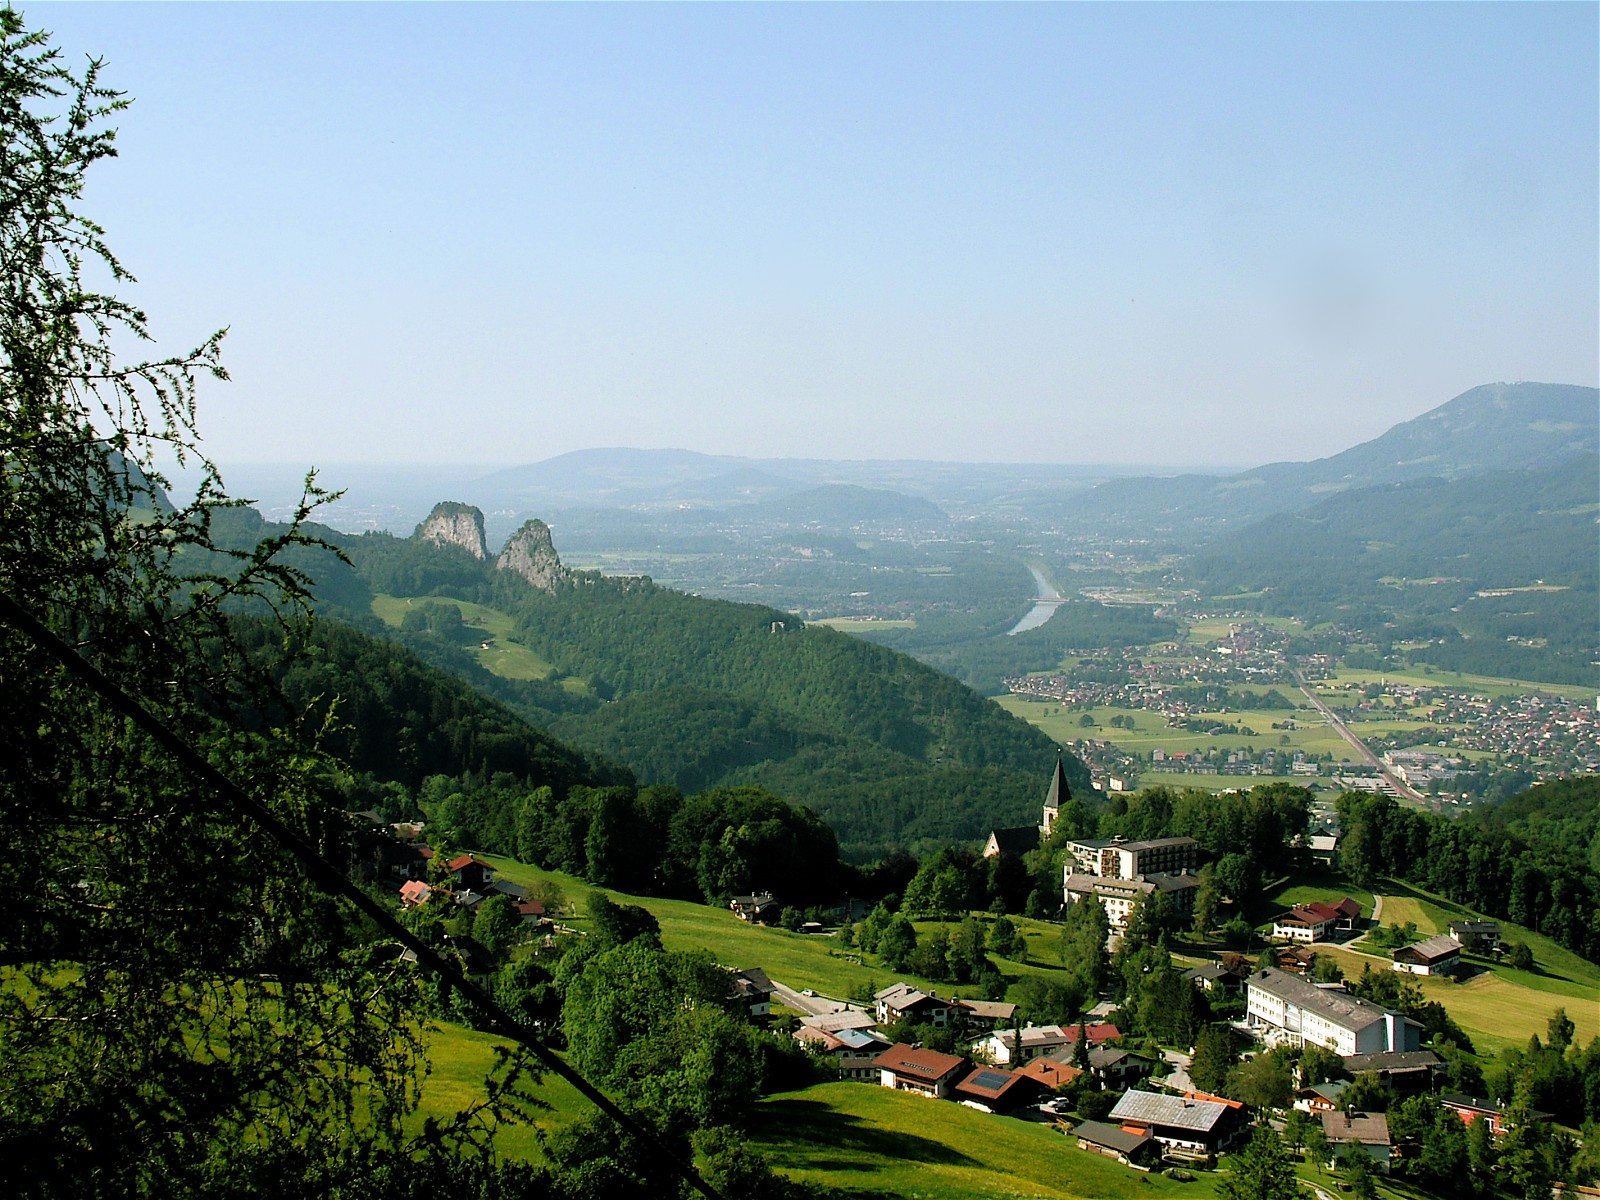 Entspannend: Blick auf Bad Dürrnberg